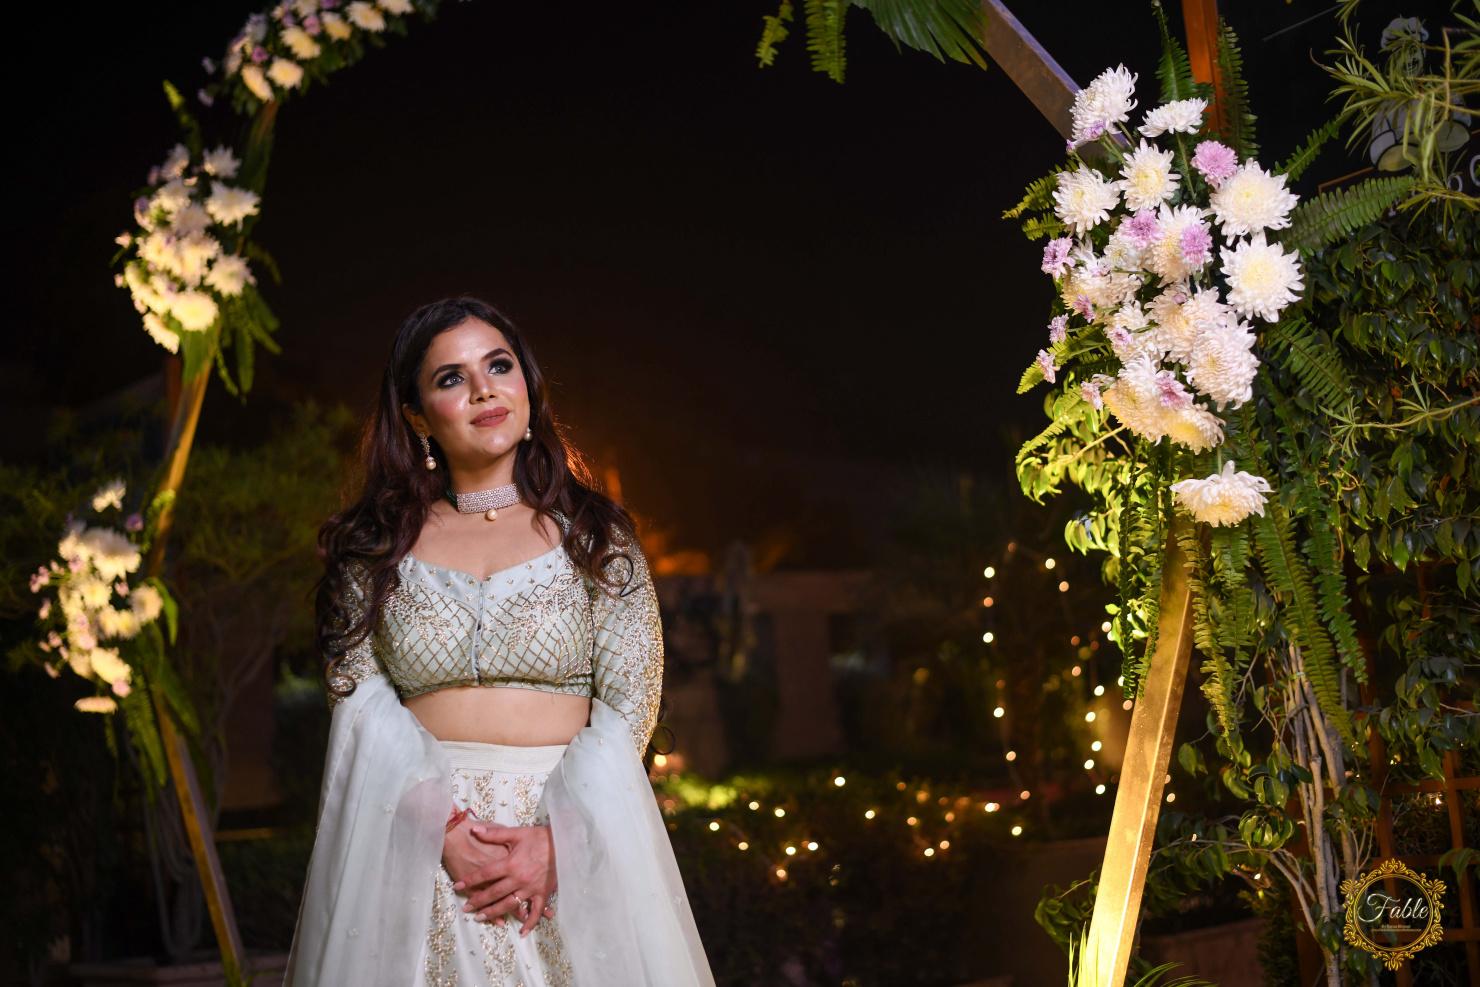 bride in smokey eye and nude lip makeup